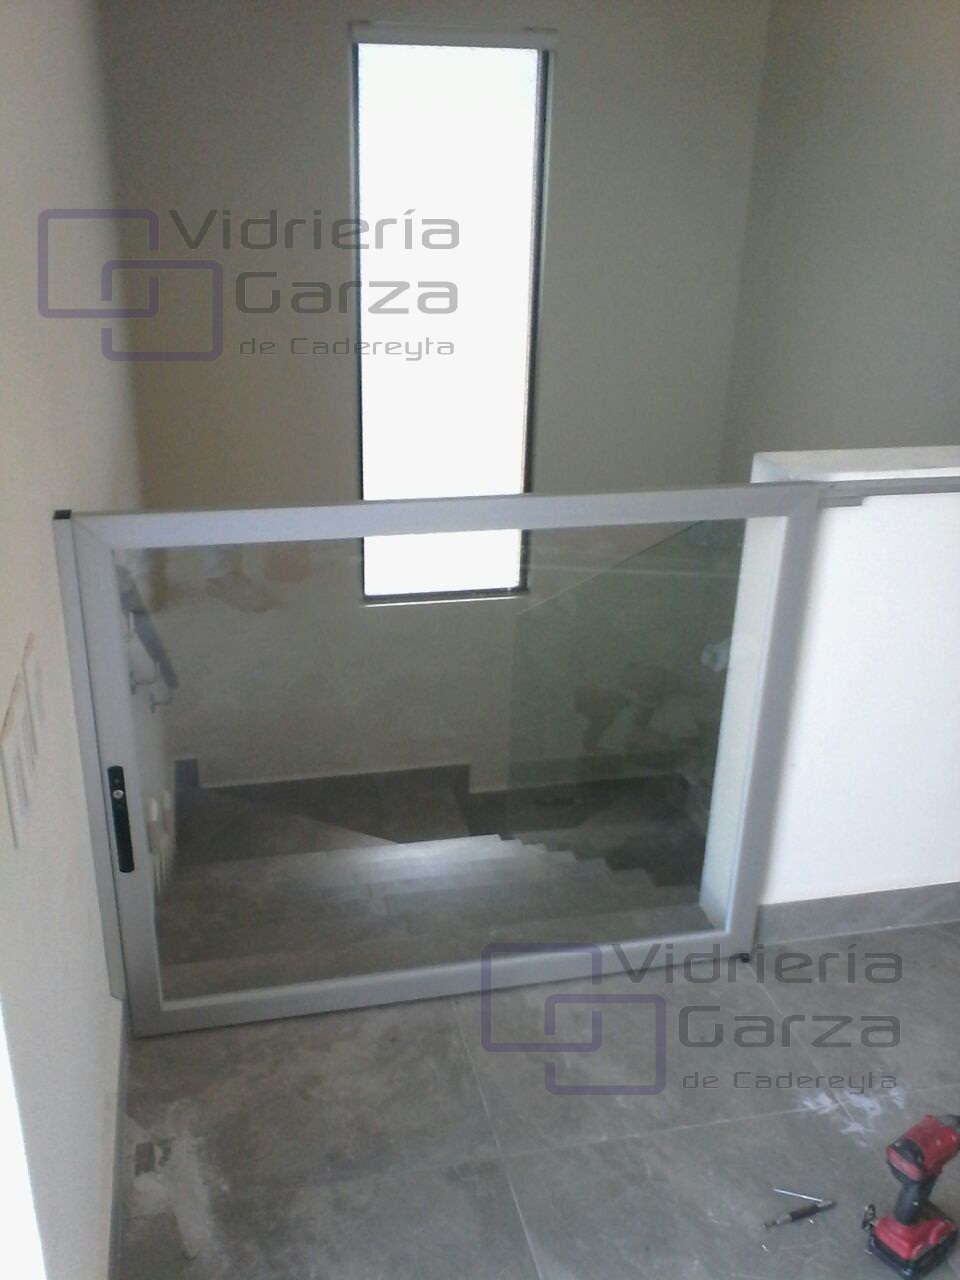 Linea panorama puerta corrediza para - Puertas para escaleras ...